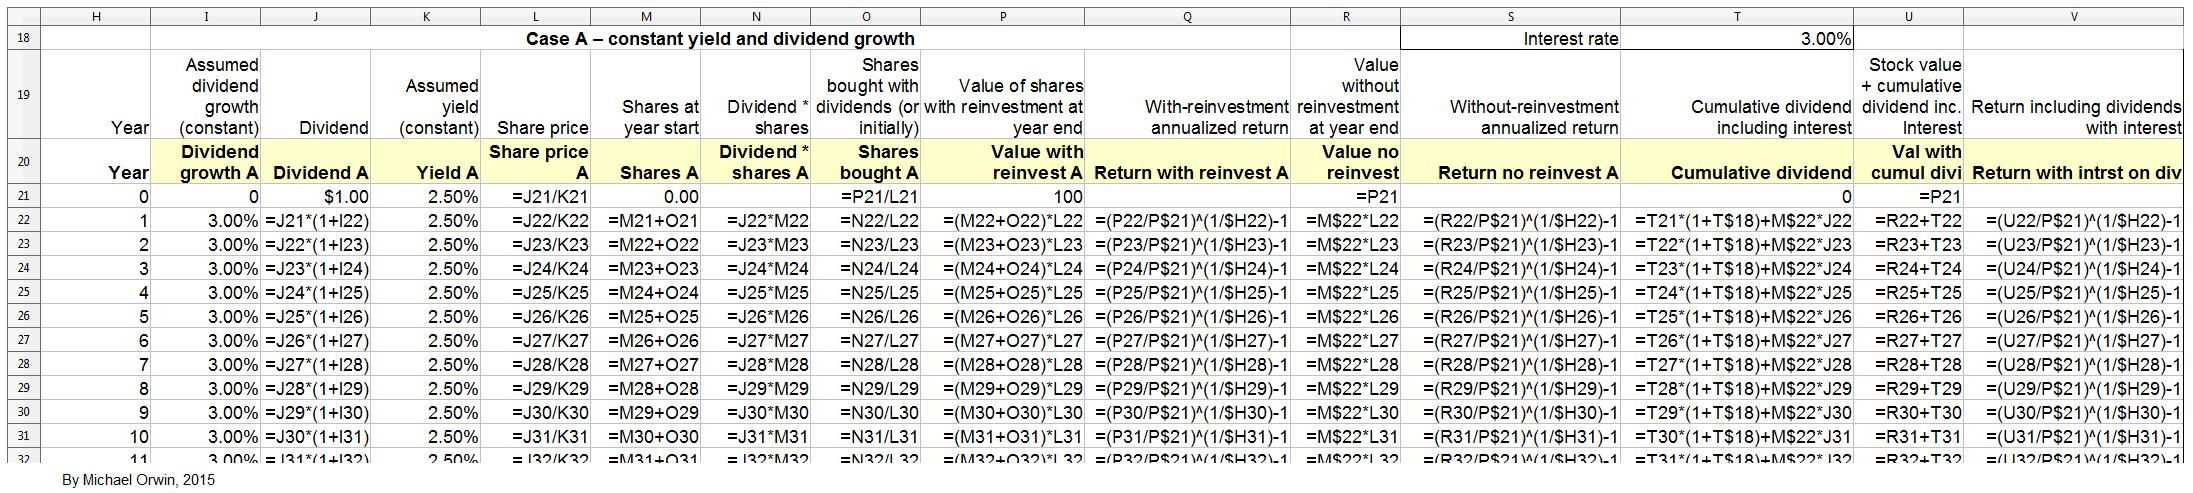 Dividend Spreadsheet Throughout Recreate A Dividend Reinvestment Spreadsheet Table  Kitchensinkinvestor